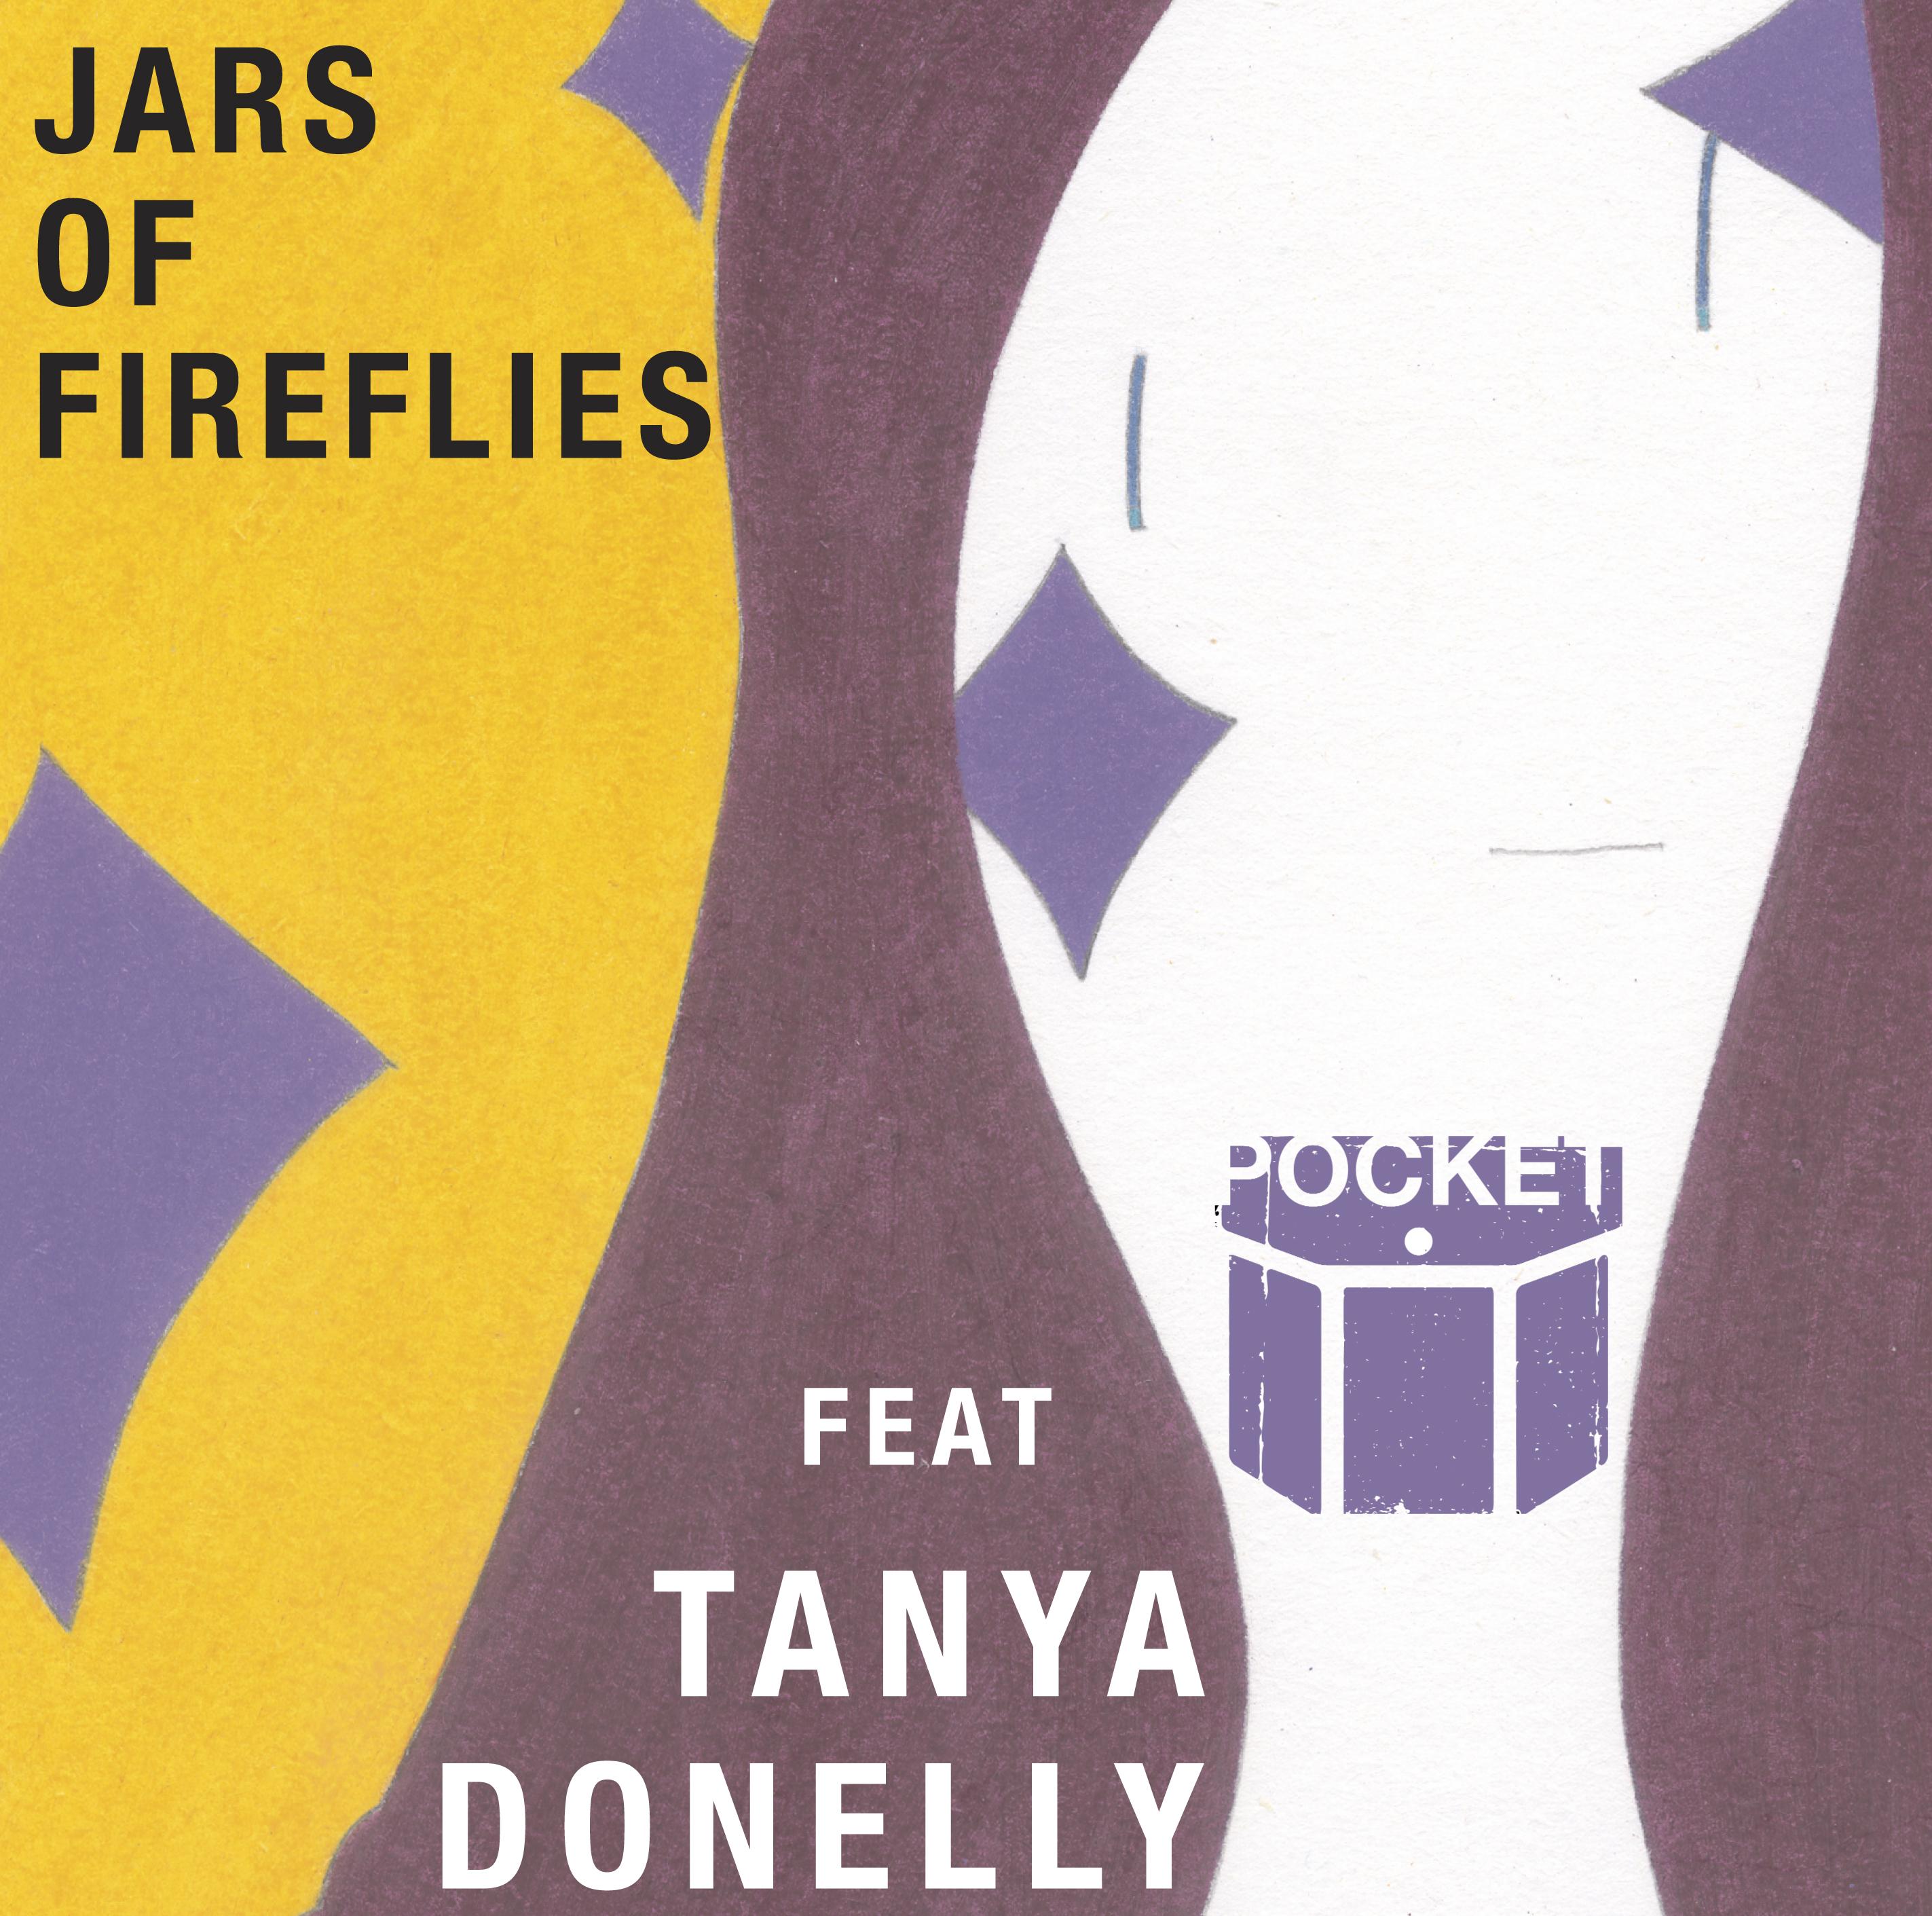 Pocket - Jars Of Fireflies (CD Single)